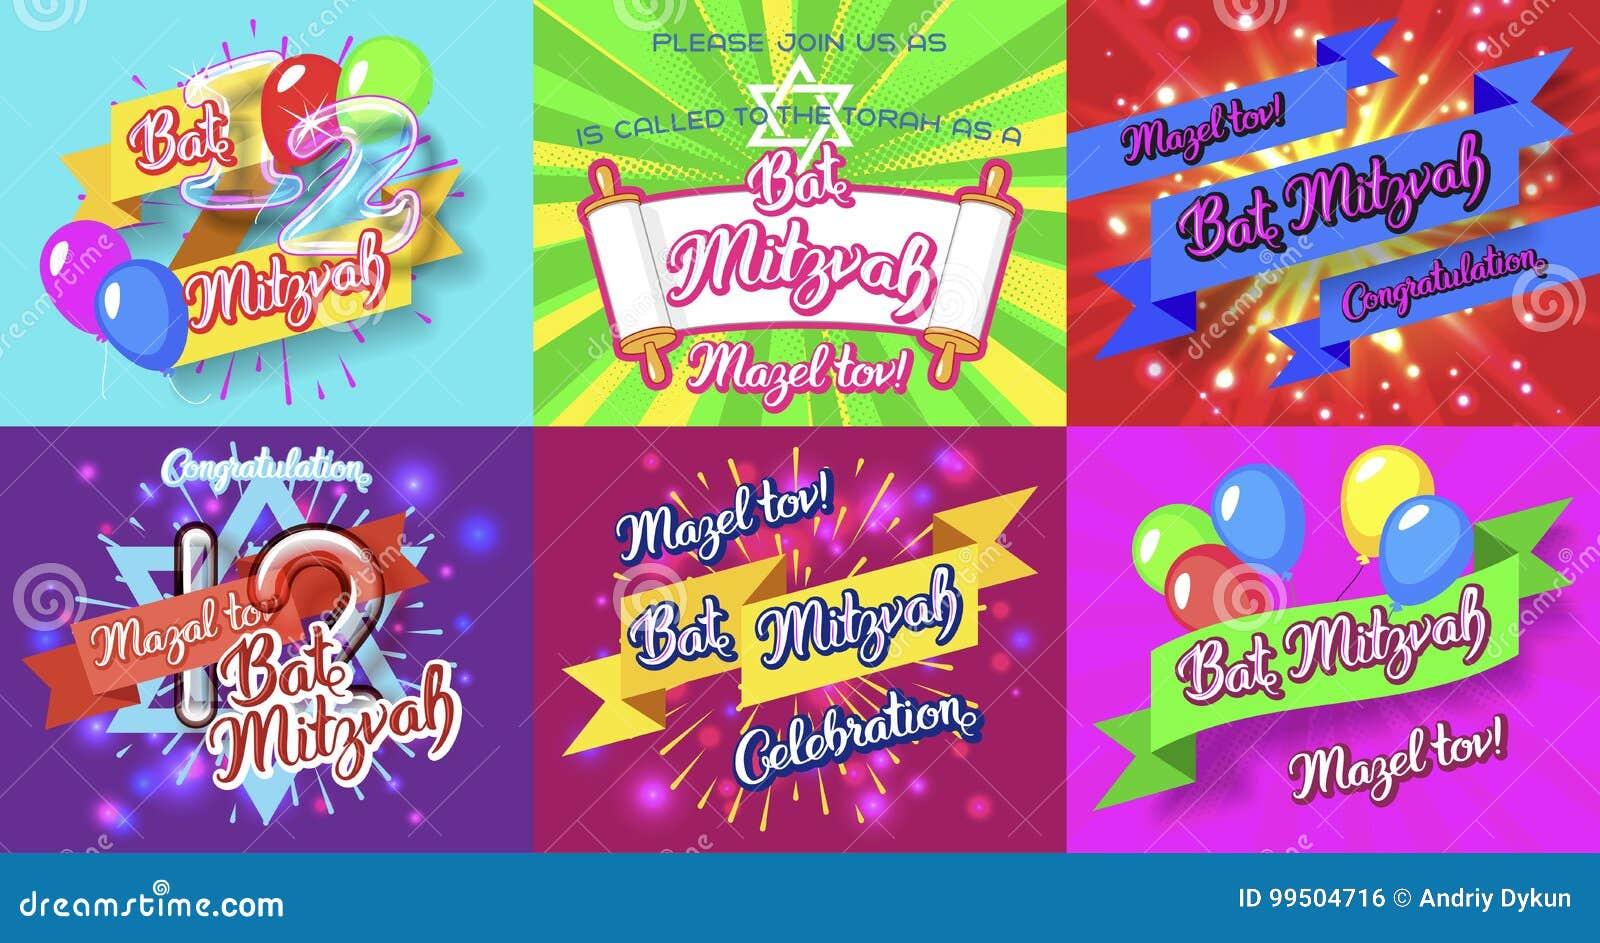 Bat Mitzvah Invitation Cards Bundle Stock Vector - Illustration of ...